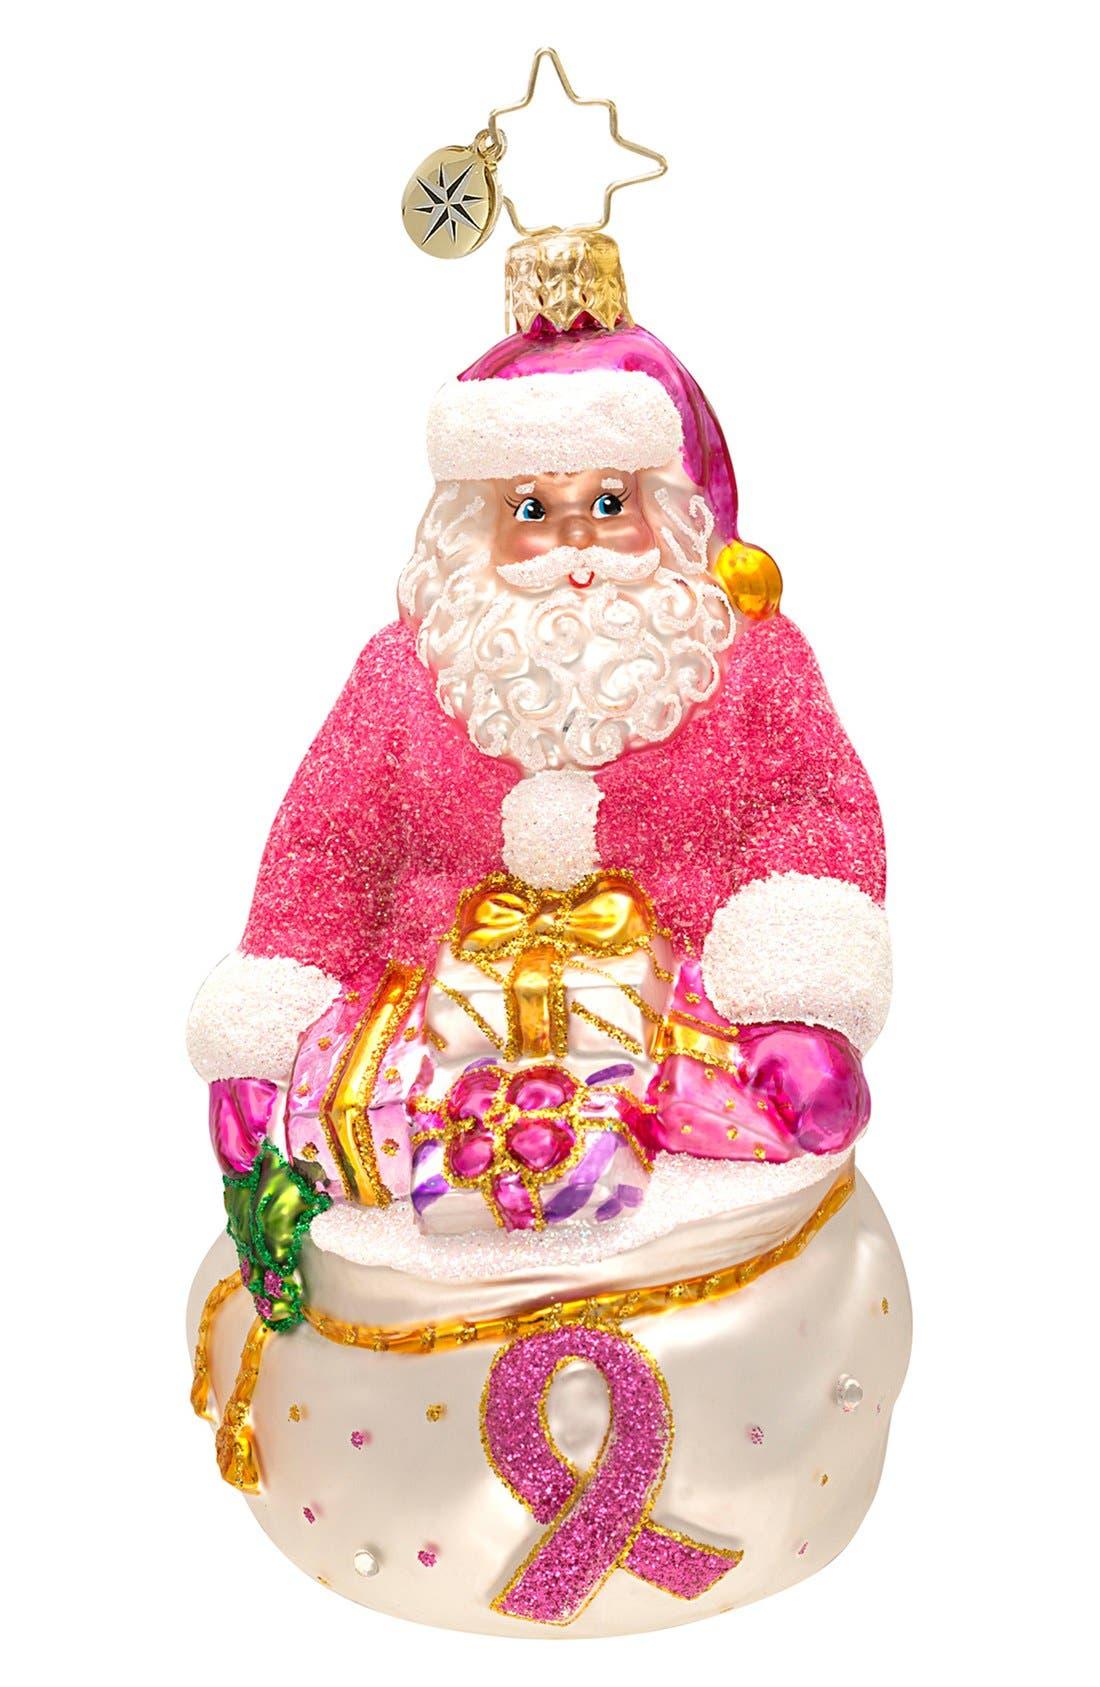 Alternate Image 1 Selected - Christopher Radko 'Think Pink Nick' Ornament